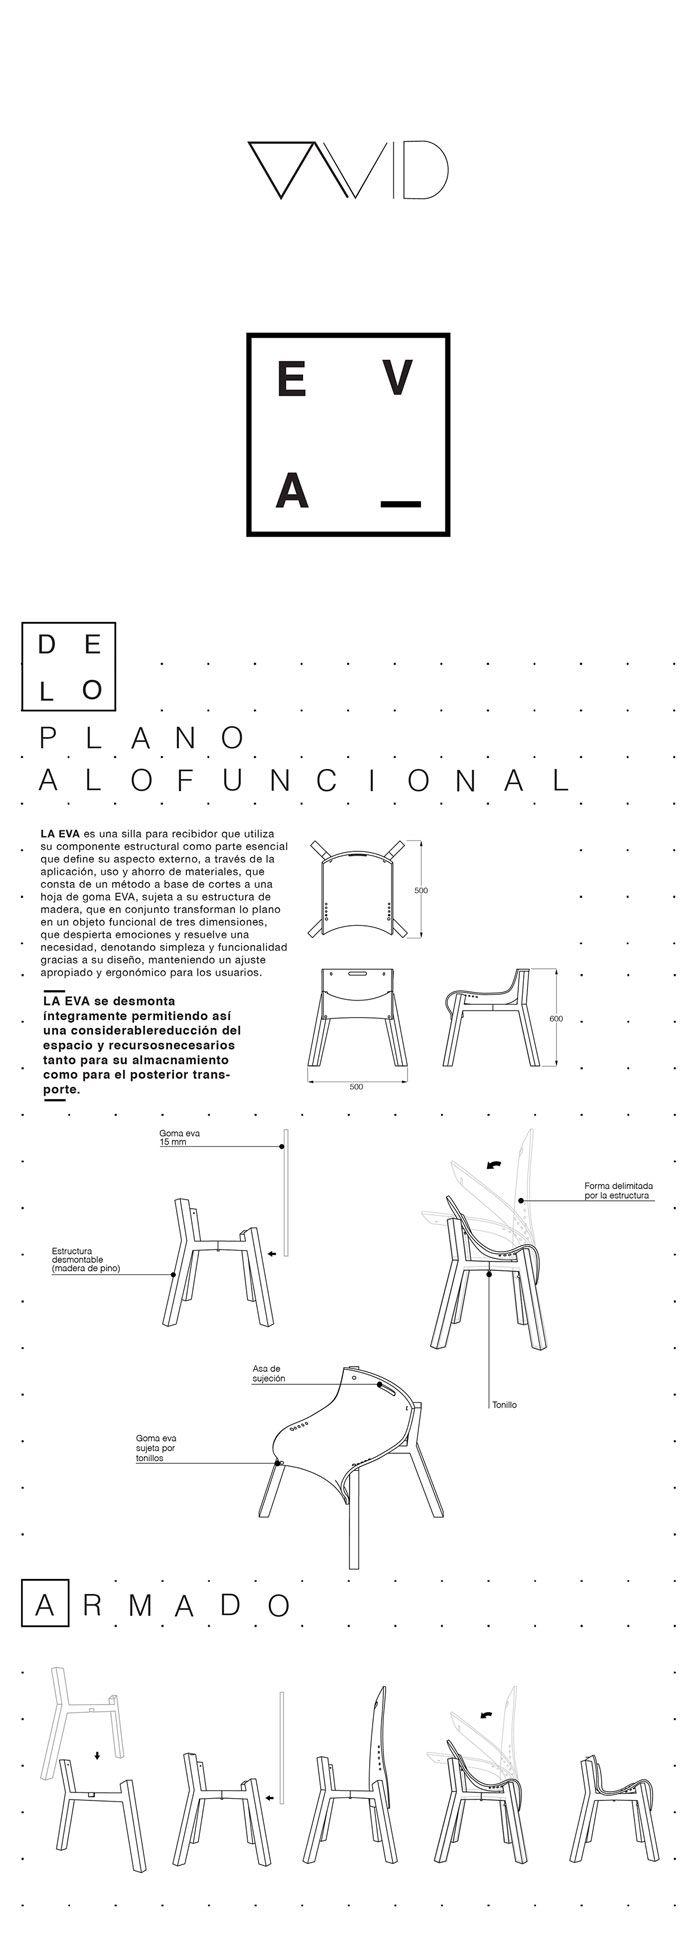 Chair design plan of the La Eva chair - unique and beautiful furniture design from San Luis Potosi, Mexico.